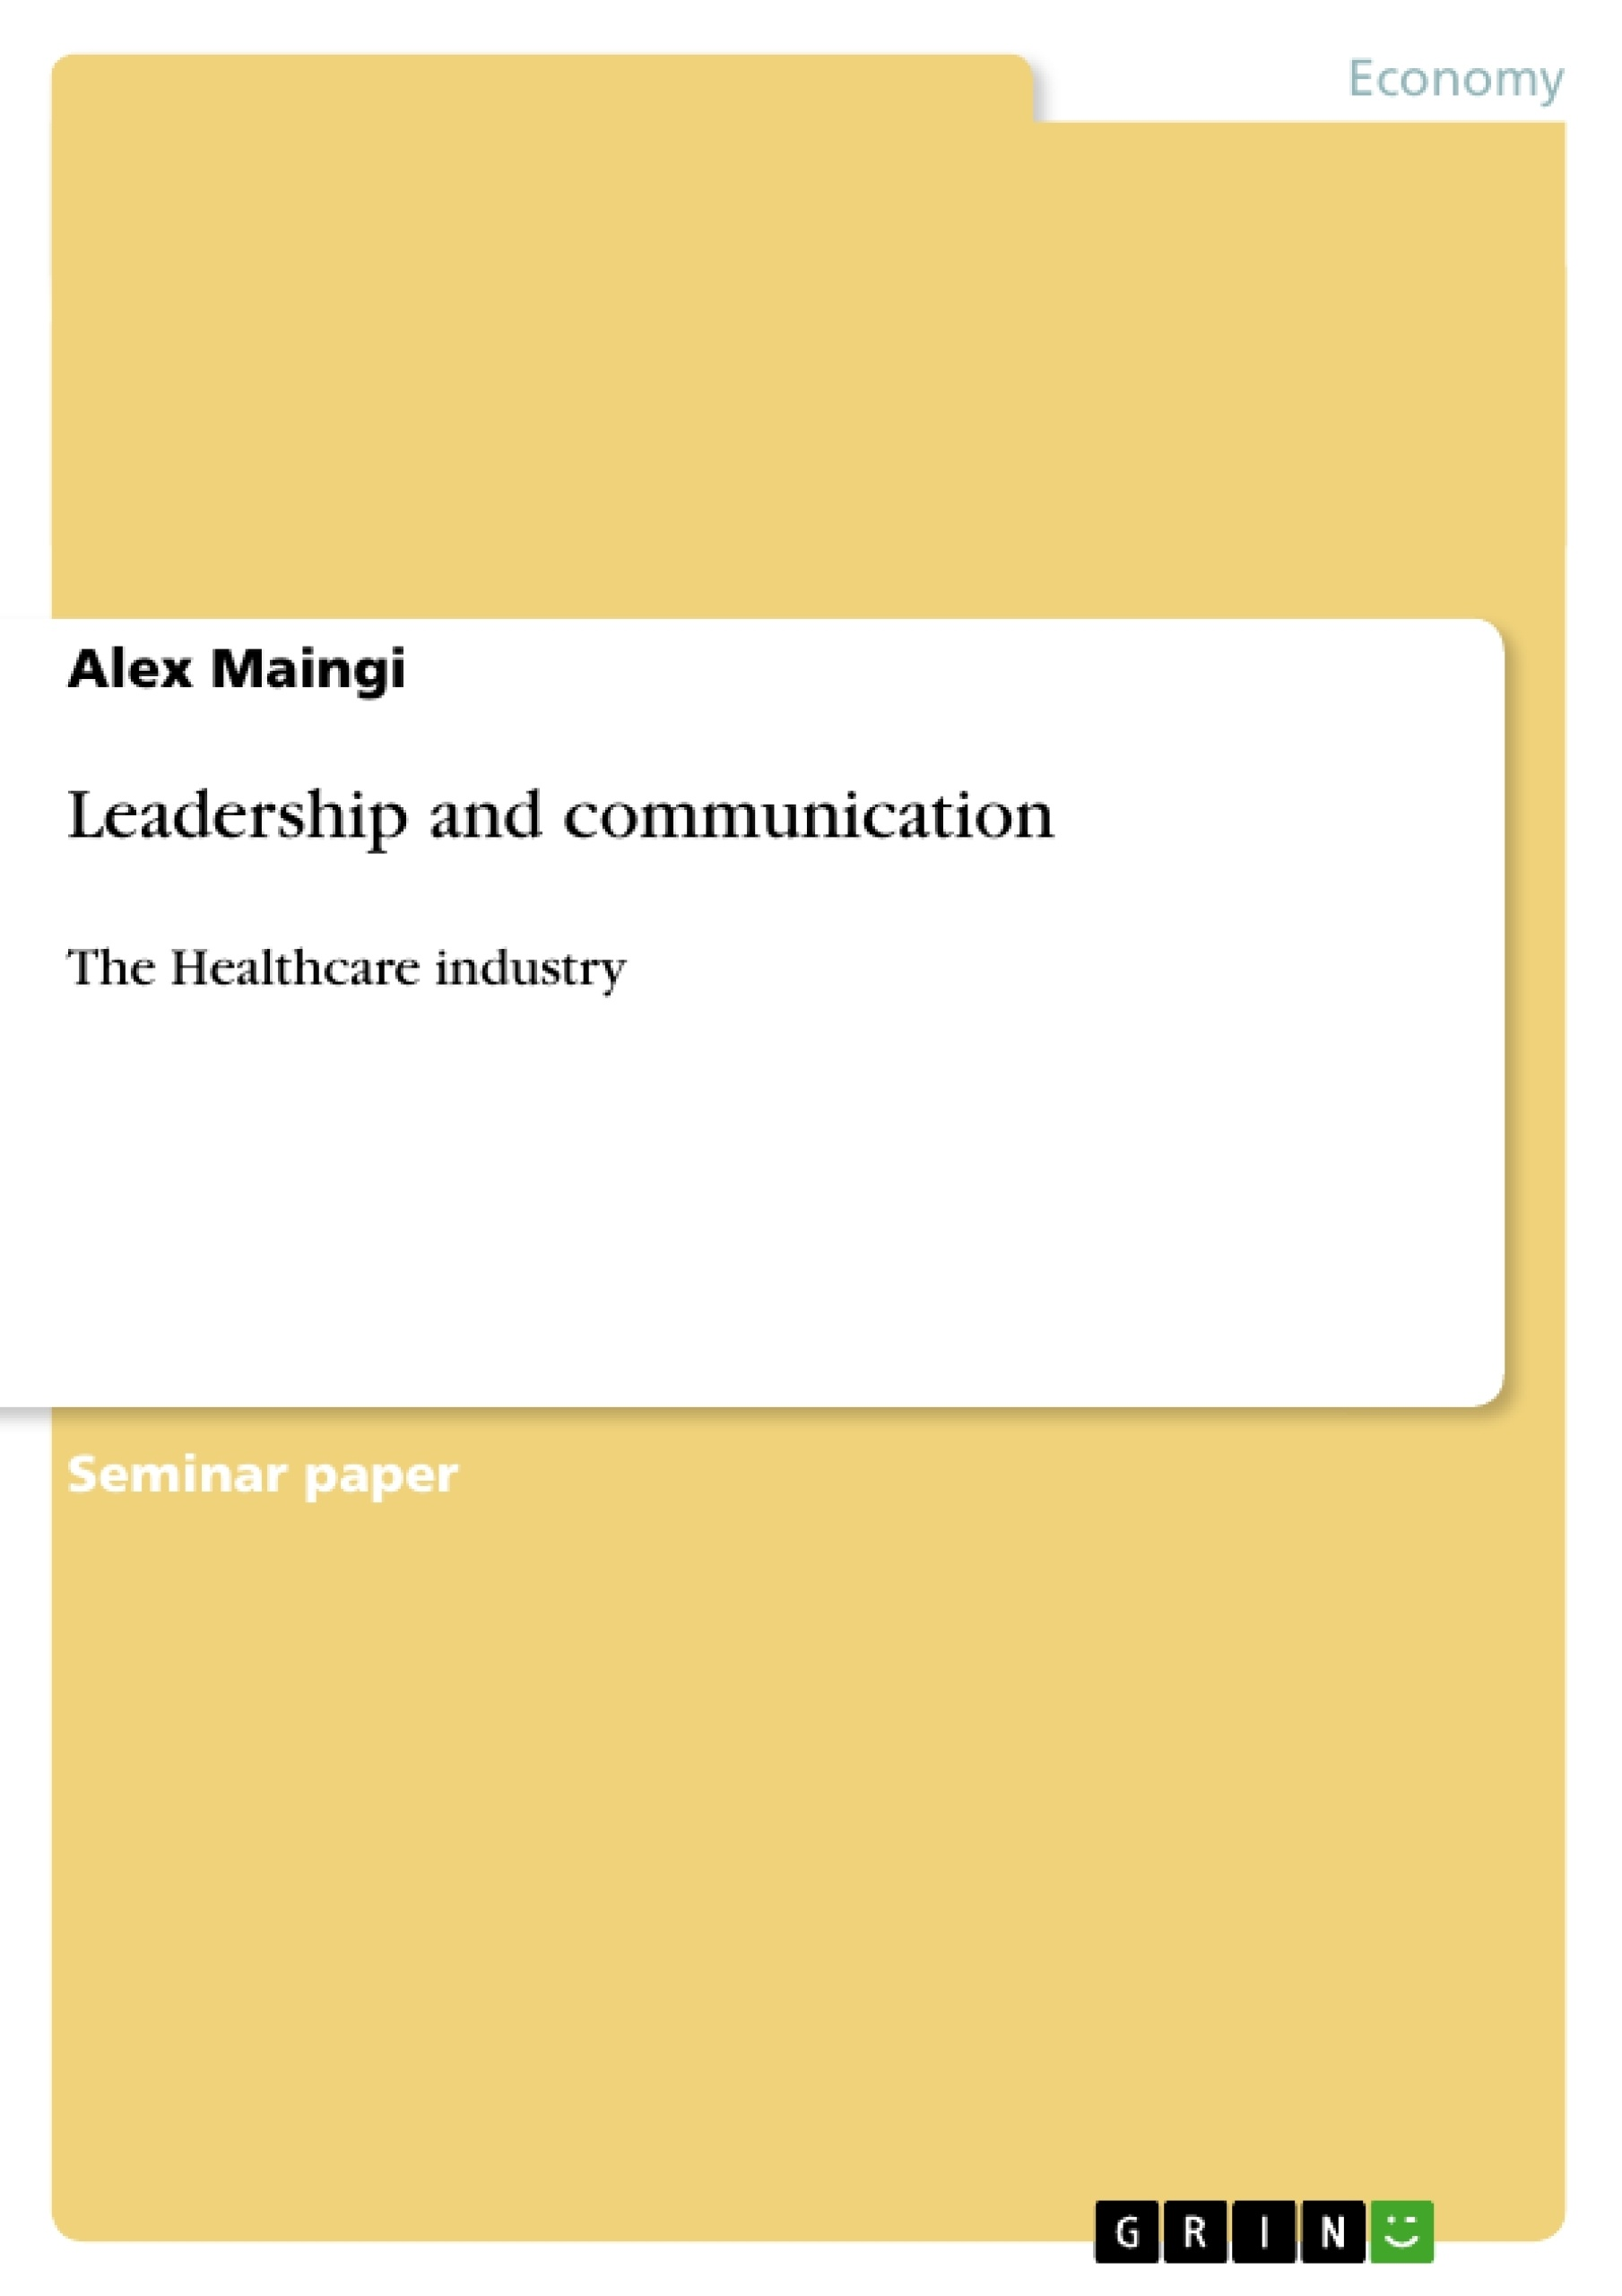 term paper on communication